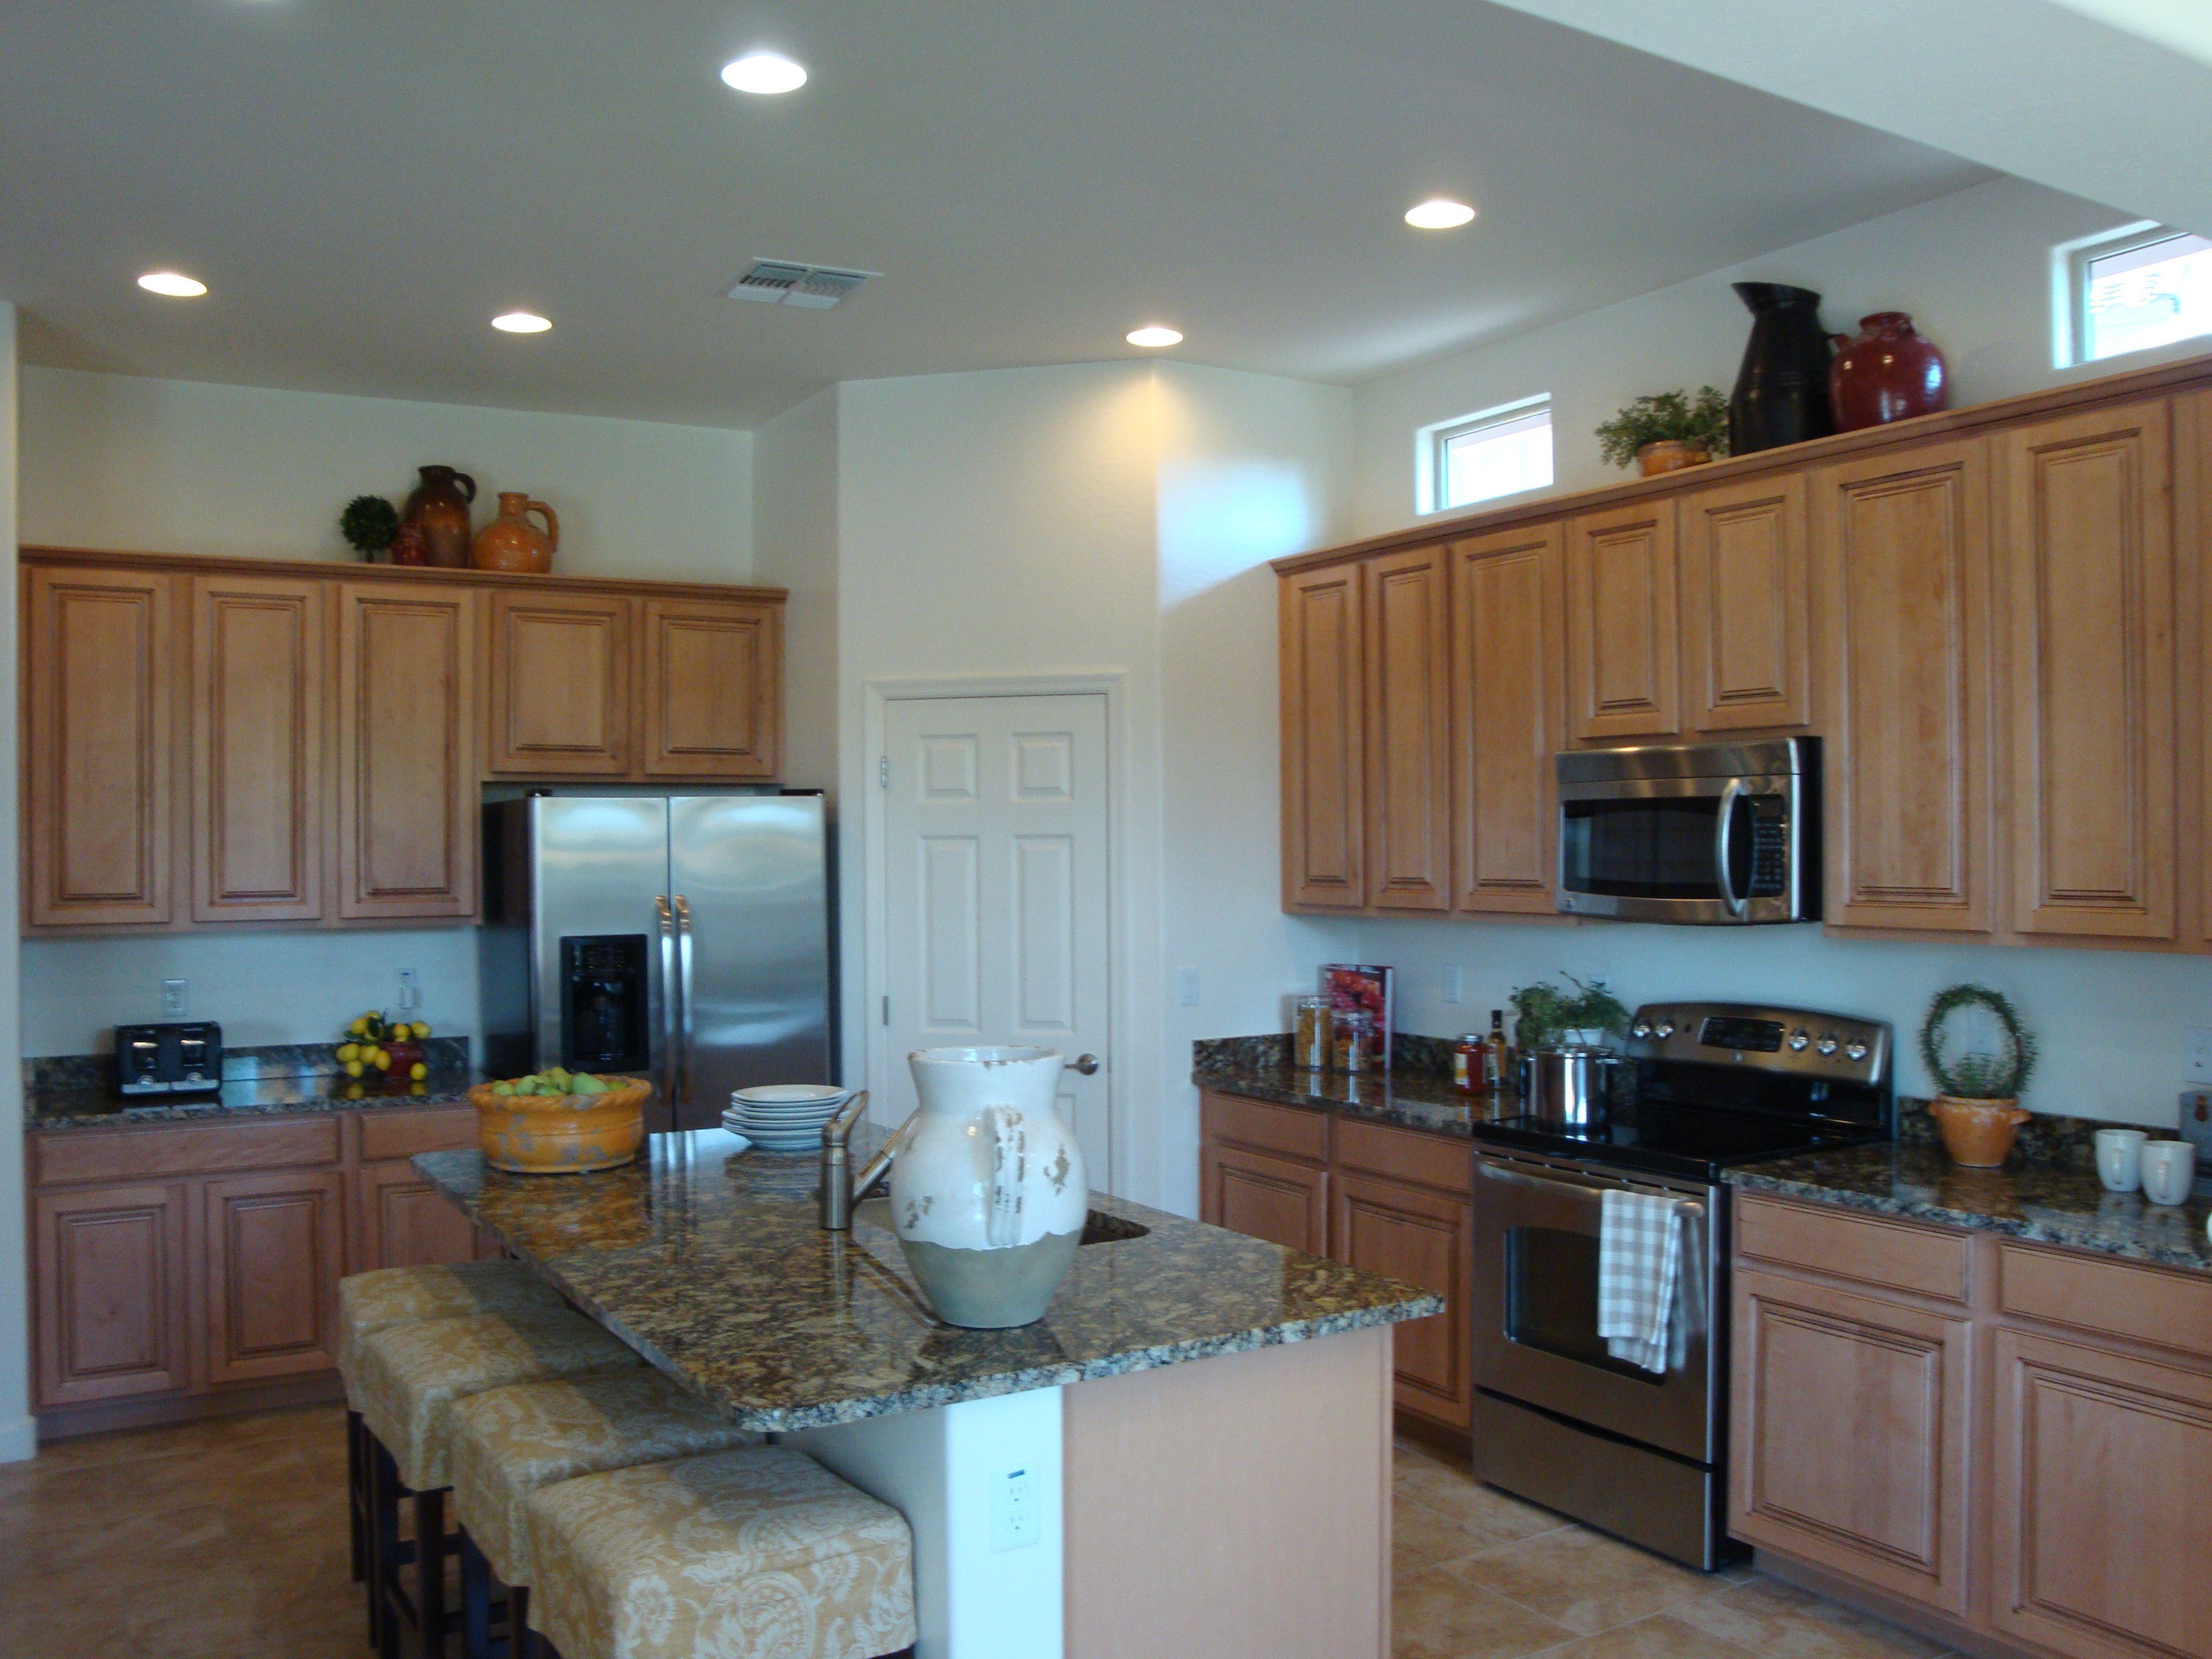 Lennar model of my kitchen | Kitchen, Kitchen cabinets